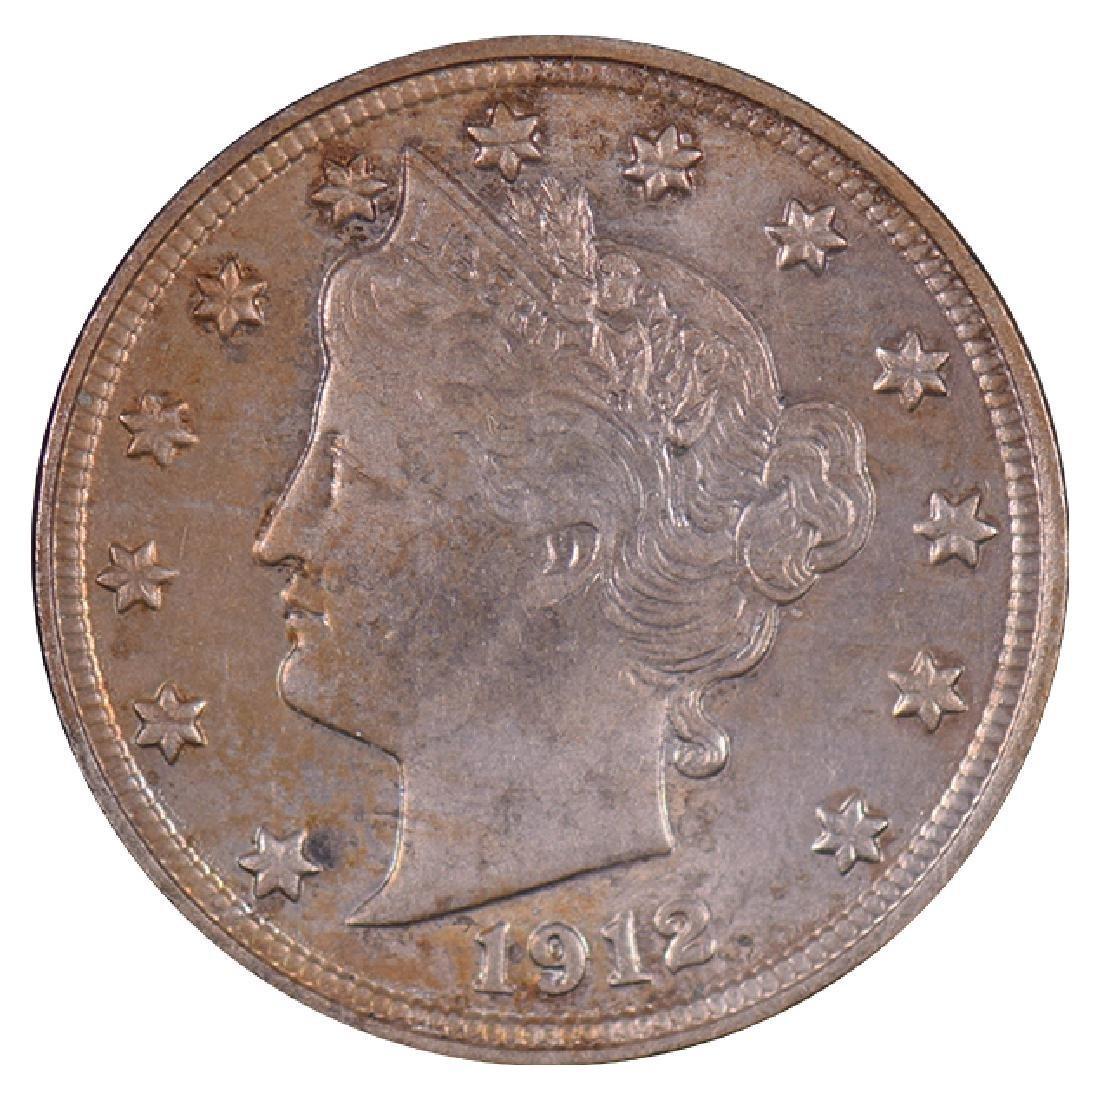 1912 Liberty Nickel Coin